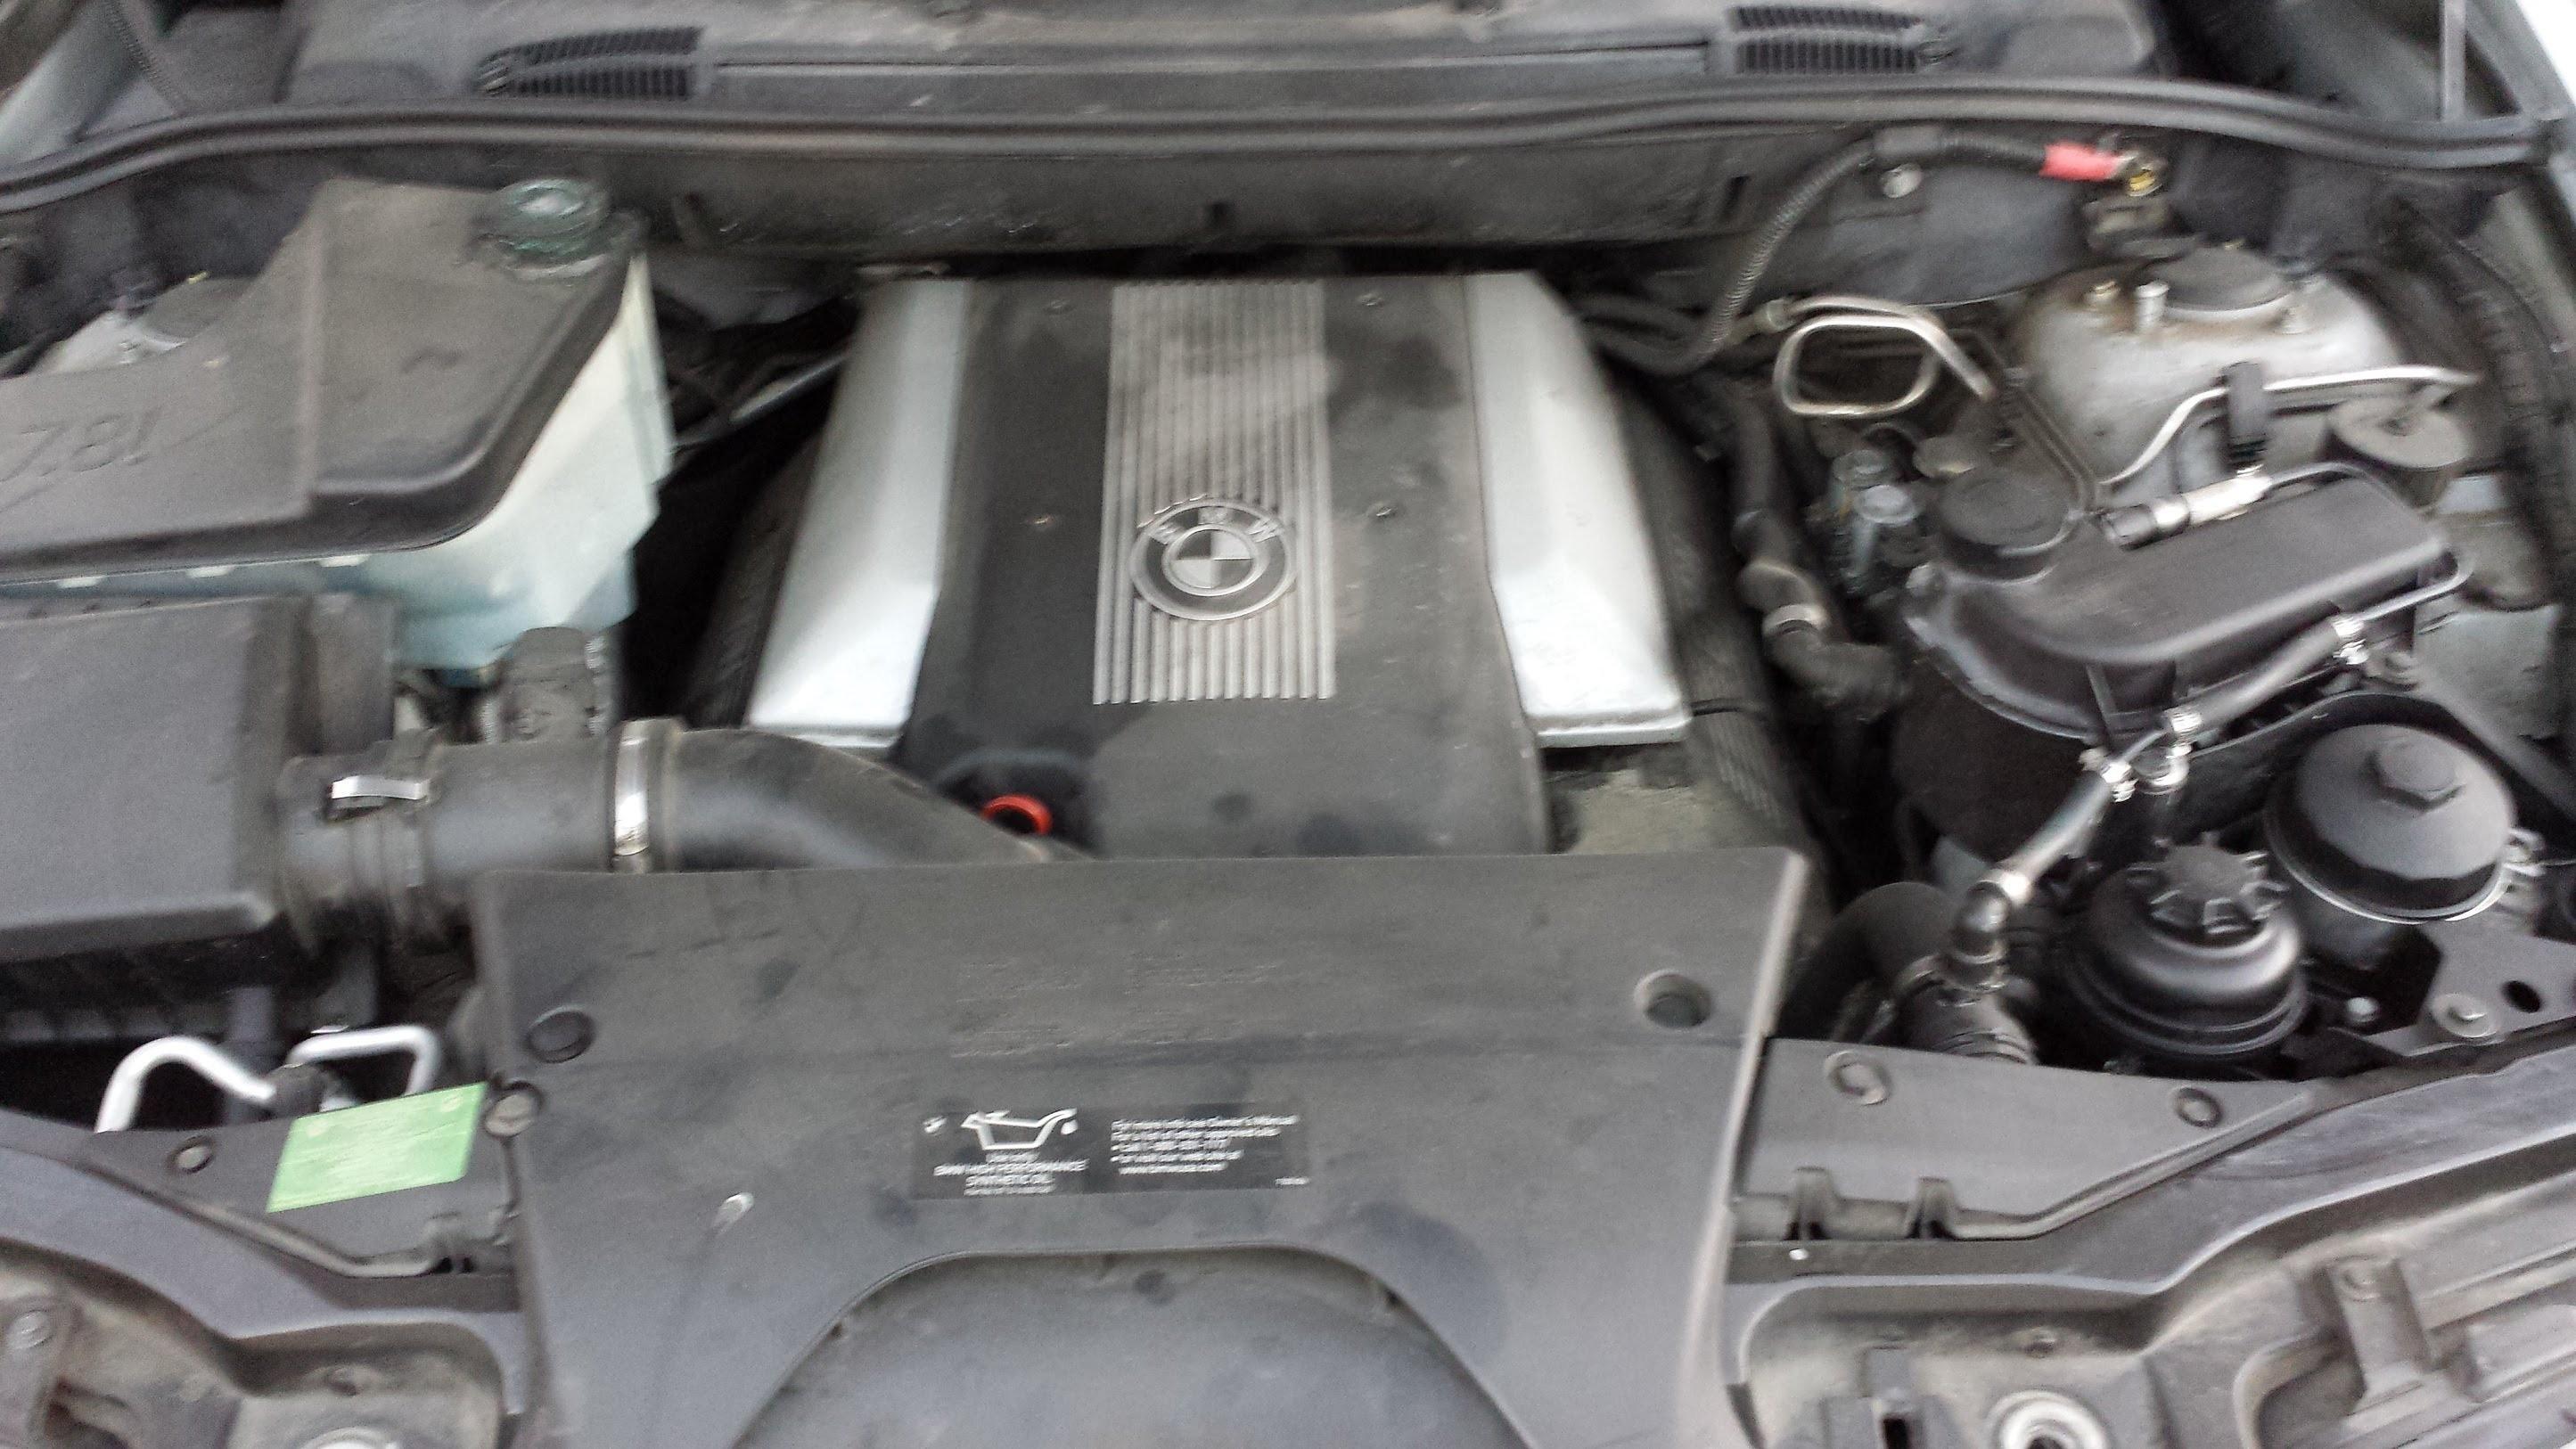 Bmw Car Parts Diagram Pelican Technical Article X3 Engine 2007 E53 X5 4 Vanos Of